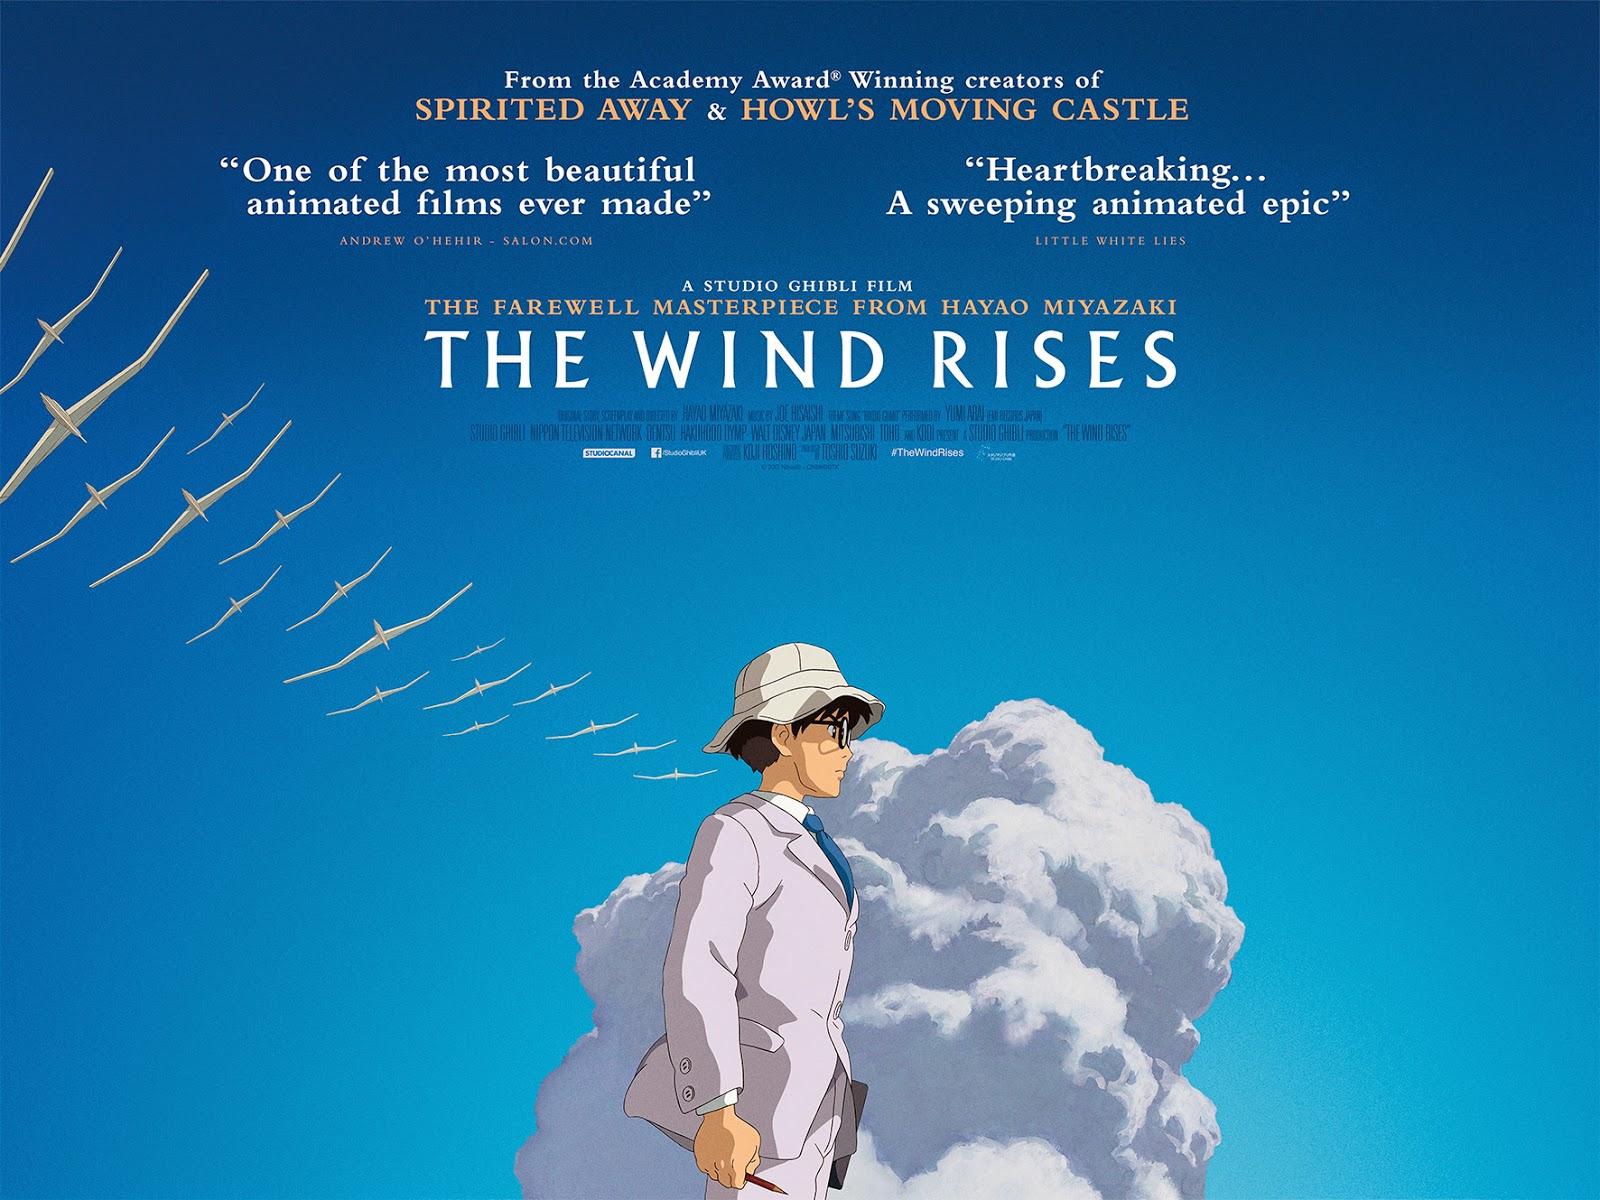 The Agitation Of Mind Wind Rises